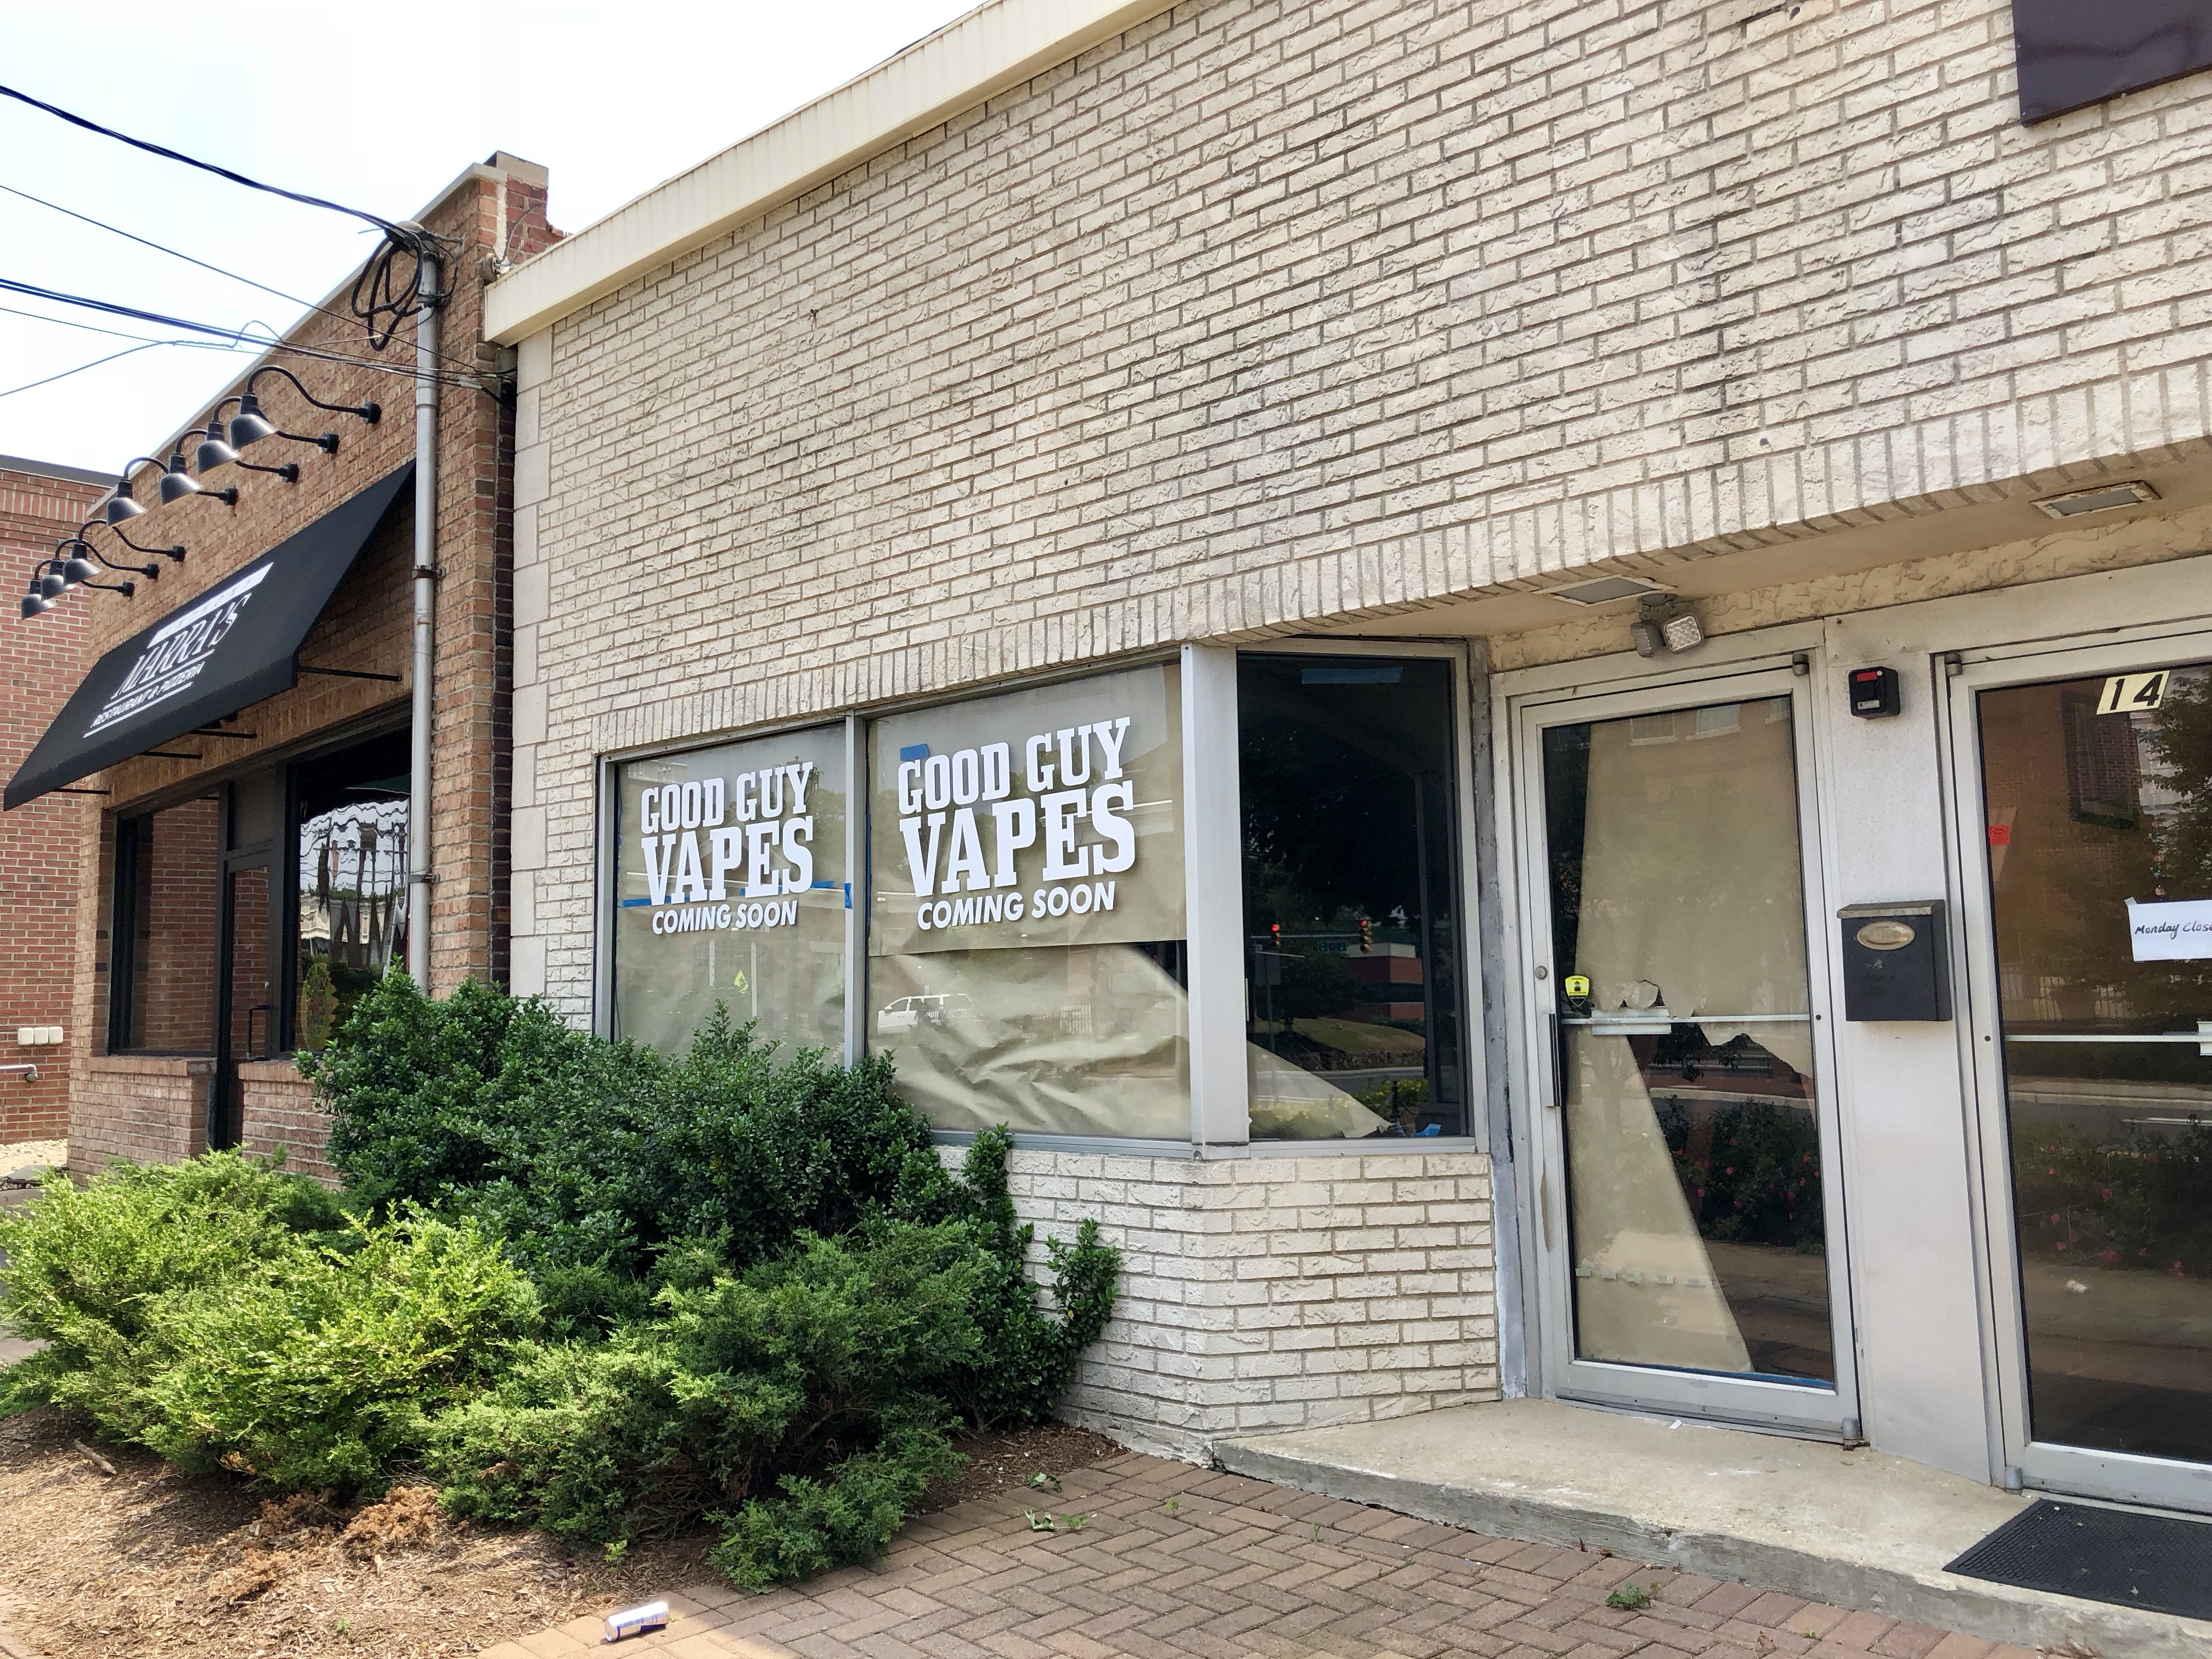 Council May Amend Regulations to Ban Vape Shops   WestEssexTribune